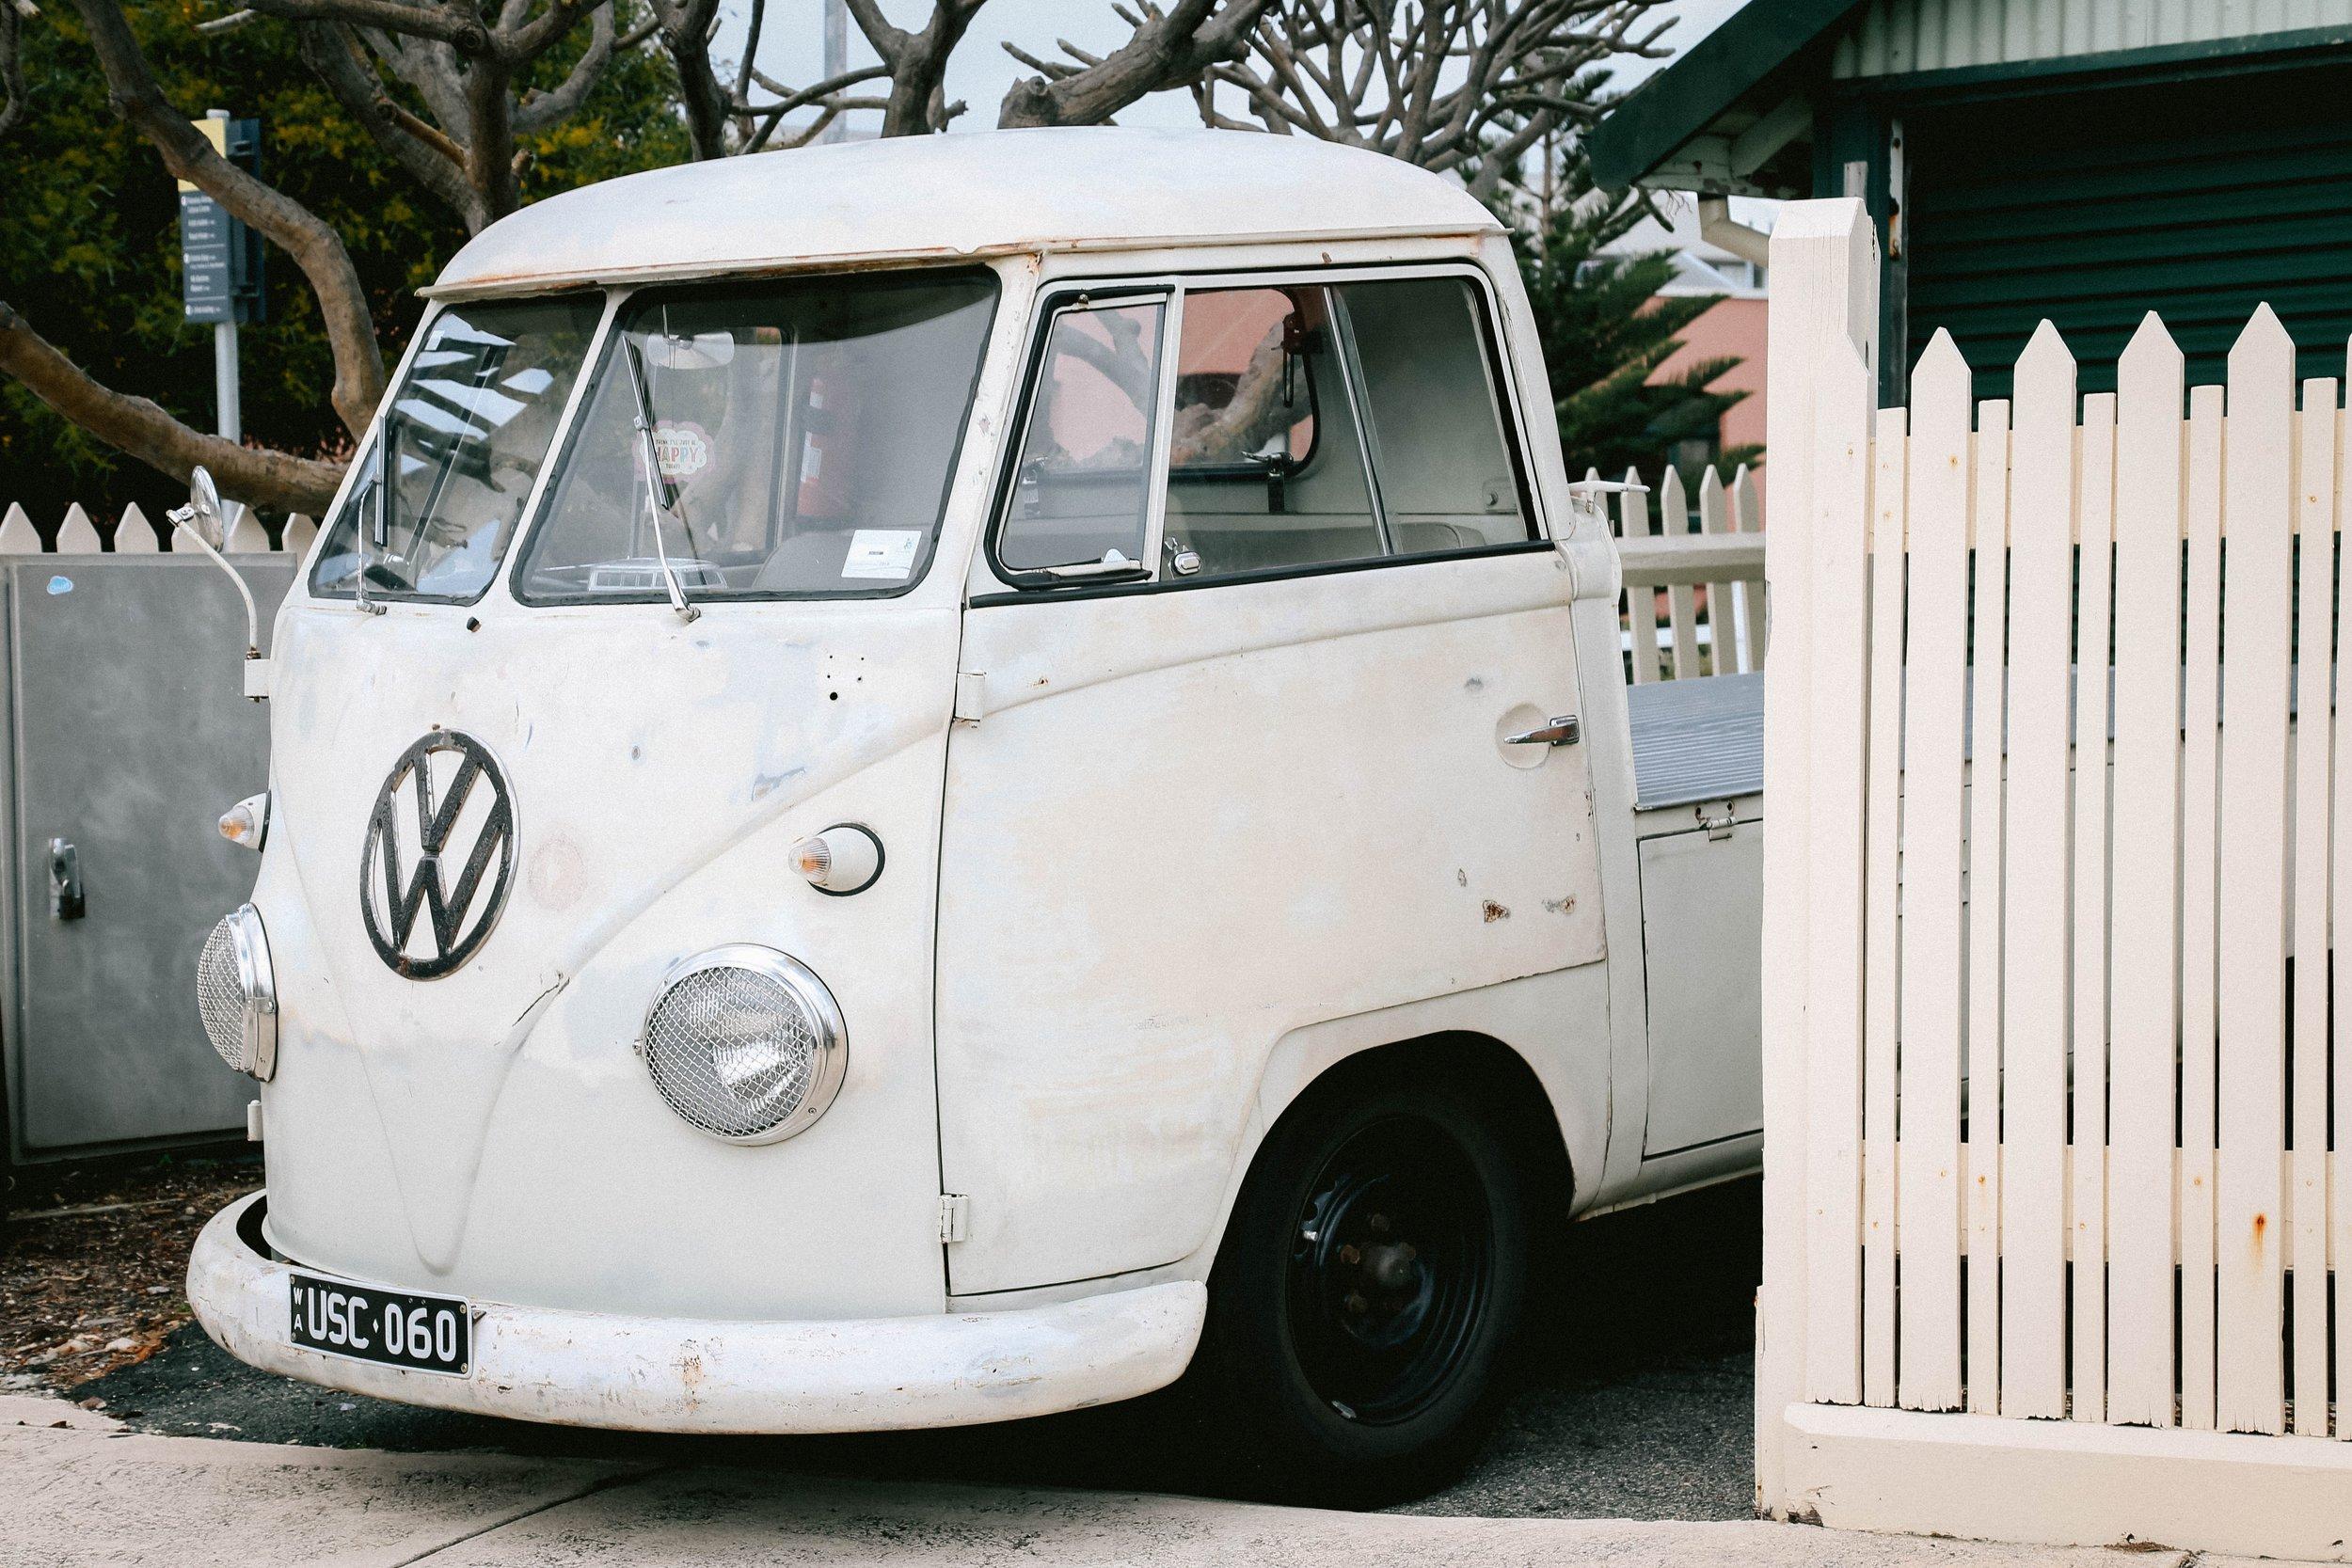 automobile-classic-classic-car-1405786.jpg